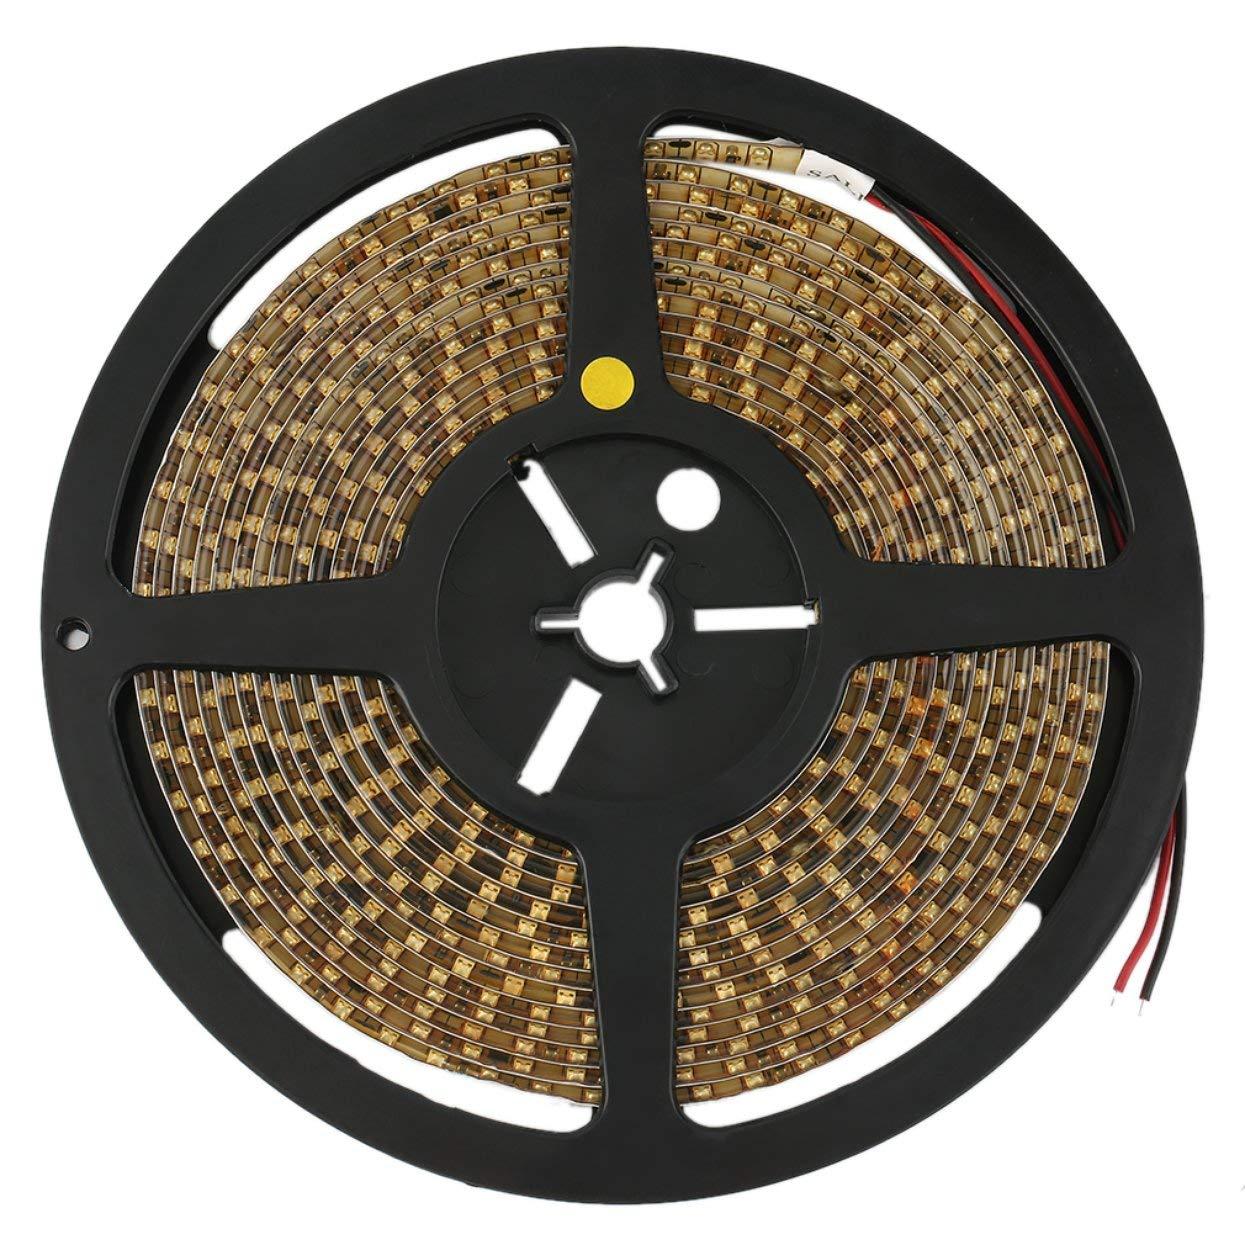 5M Car Yellow 3528 SMD LED Waterproof Flexible Strip 12V 600 LEDs LoveOlvidoY